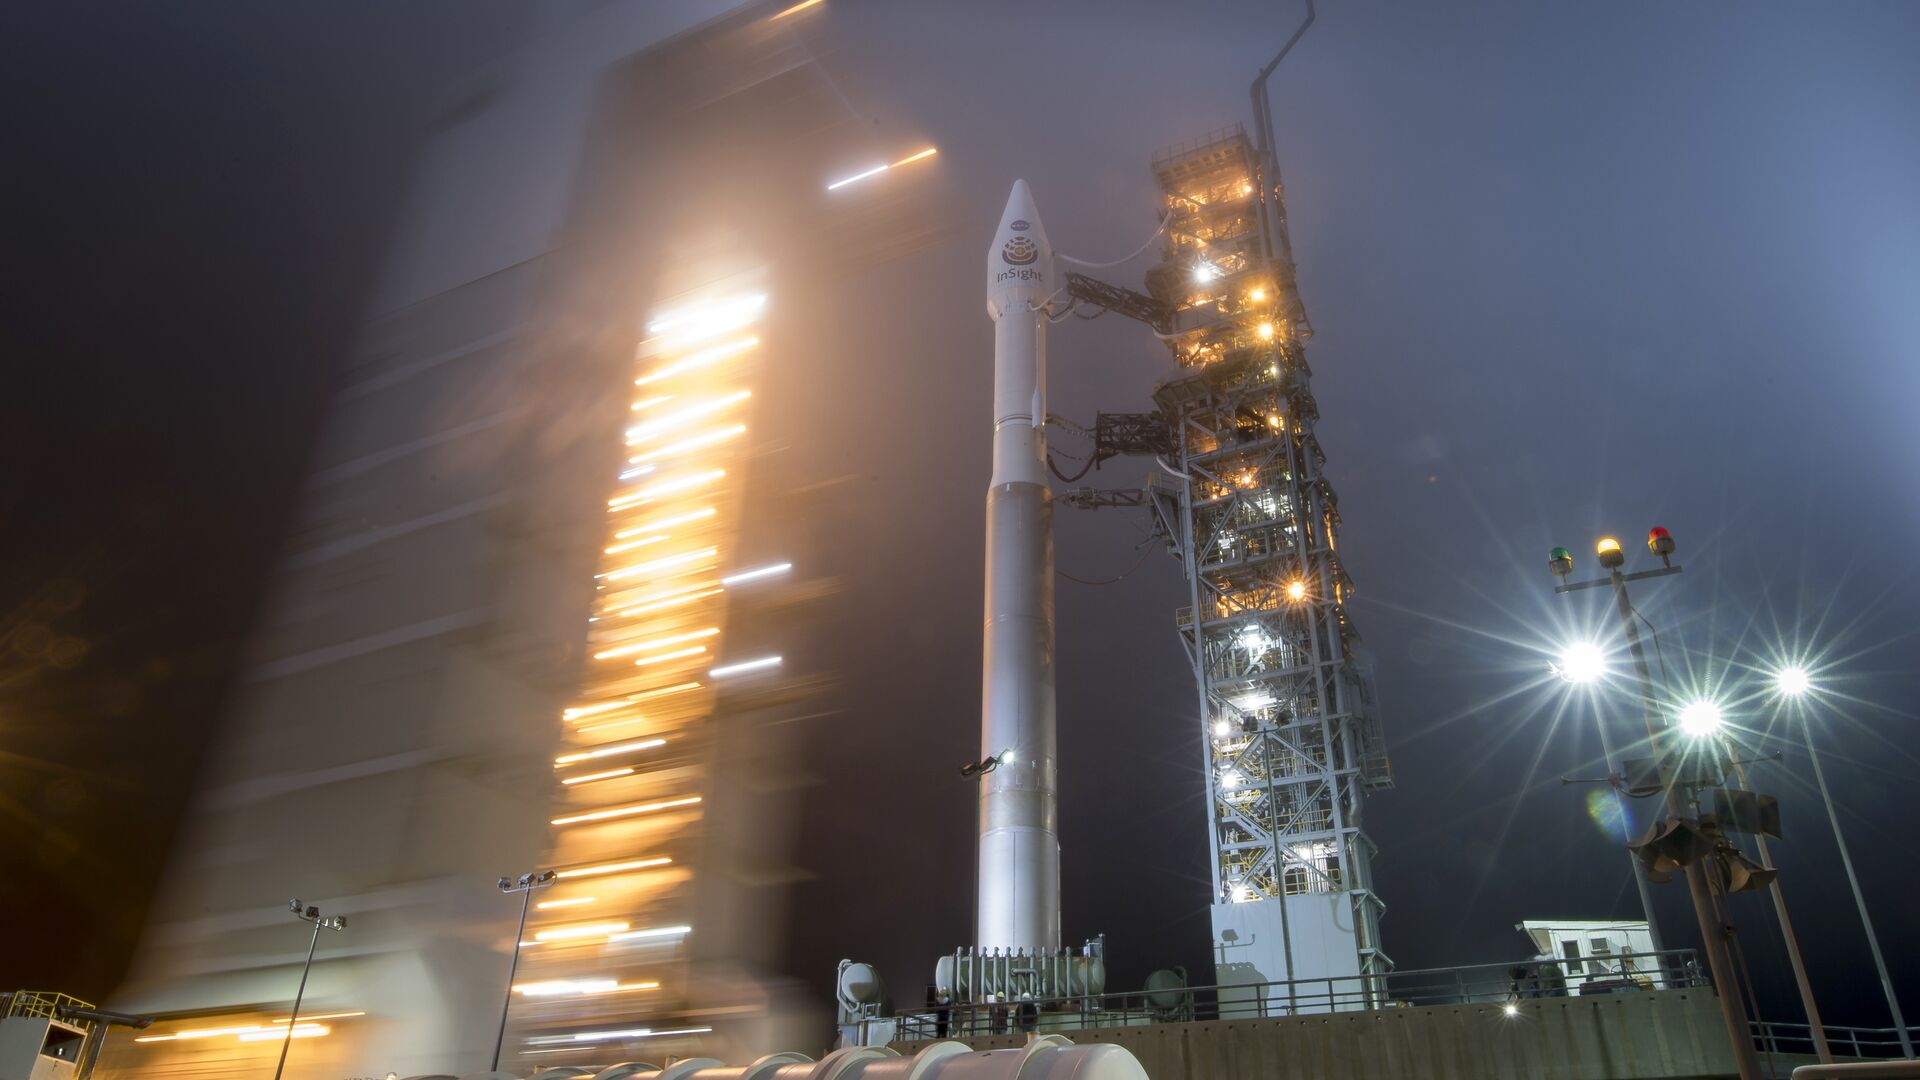 Ракета Atlas-V United Launch Alliance с космическим аппаратом NASA InSight на борту перед стартом - РИА Новости, 1920, 23.12.2020